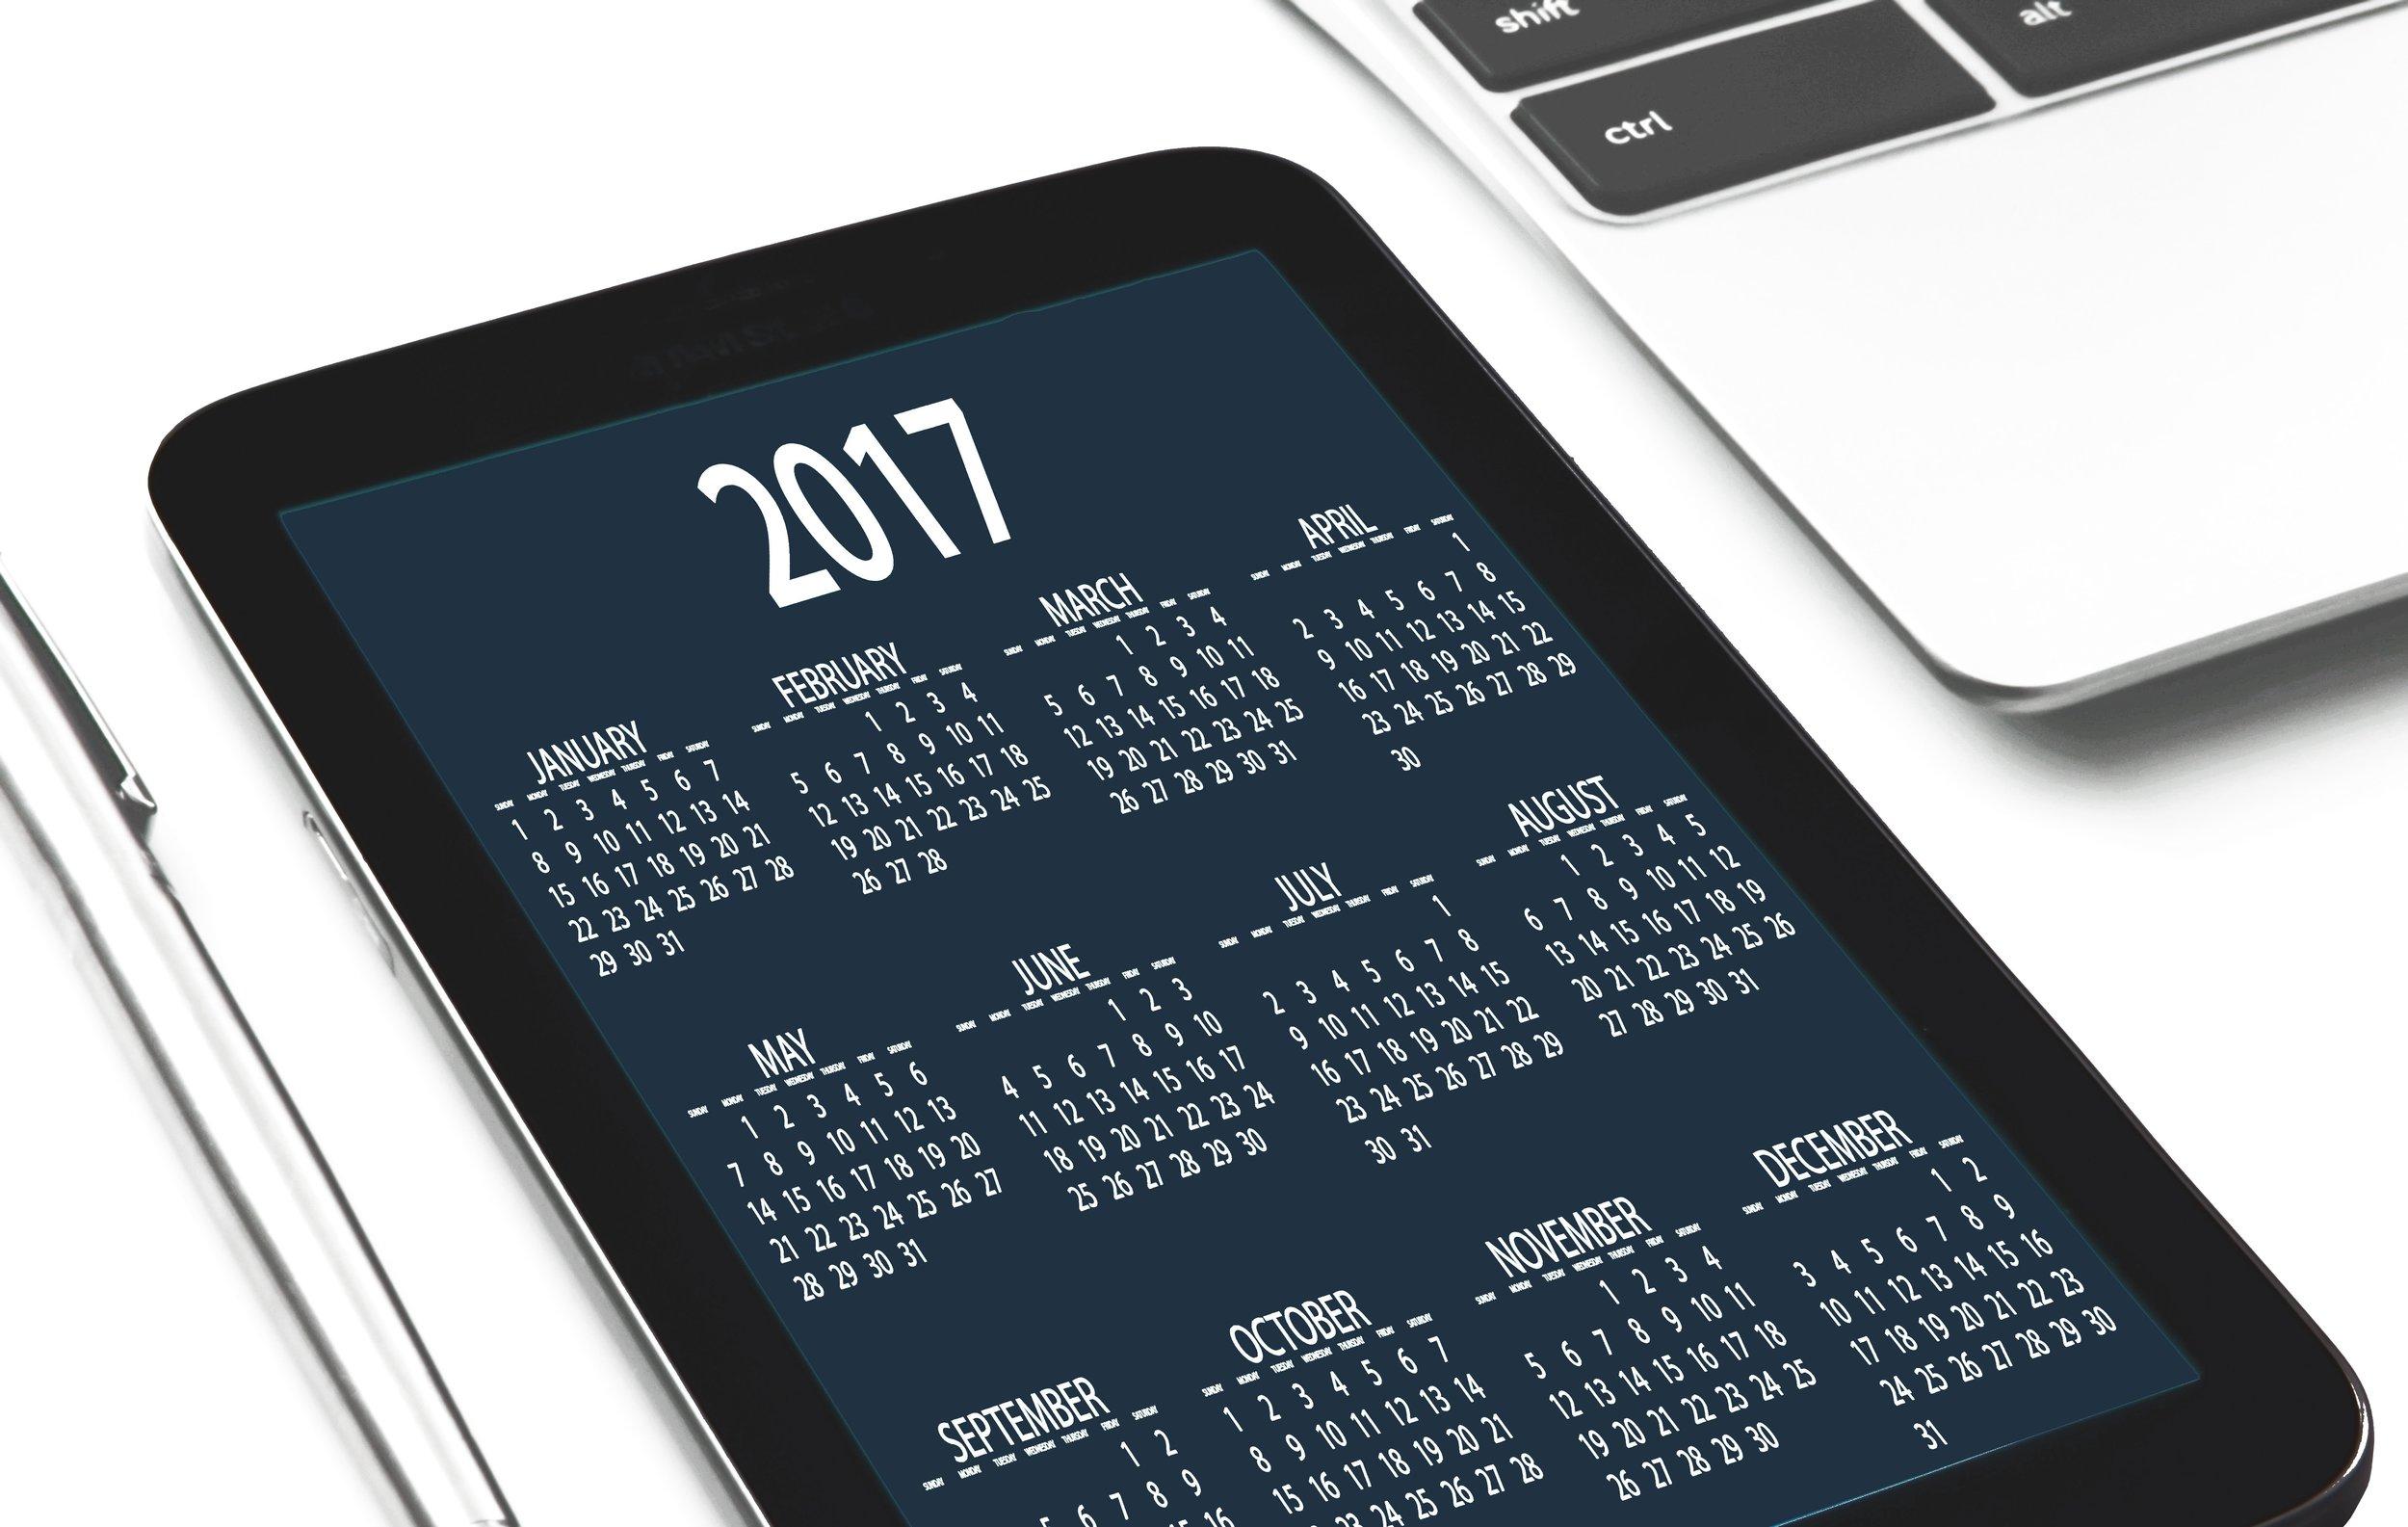 calendar-date-device-289689.jpg